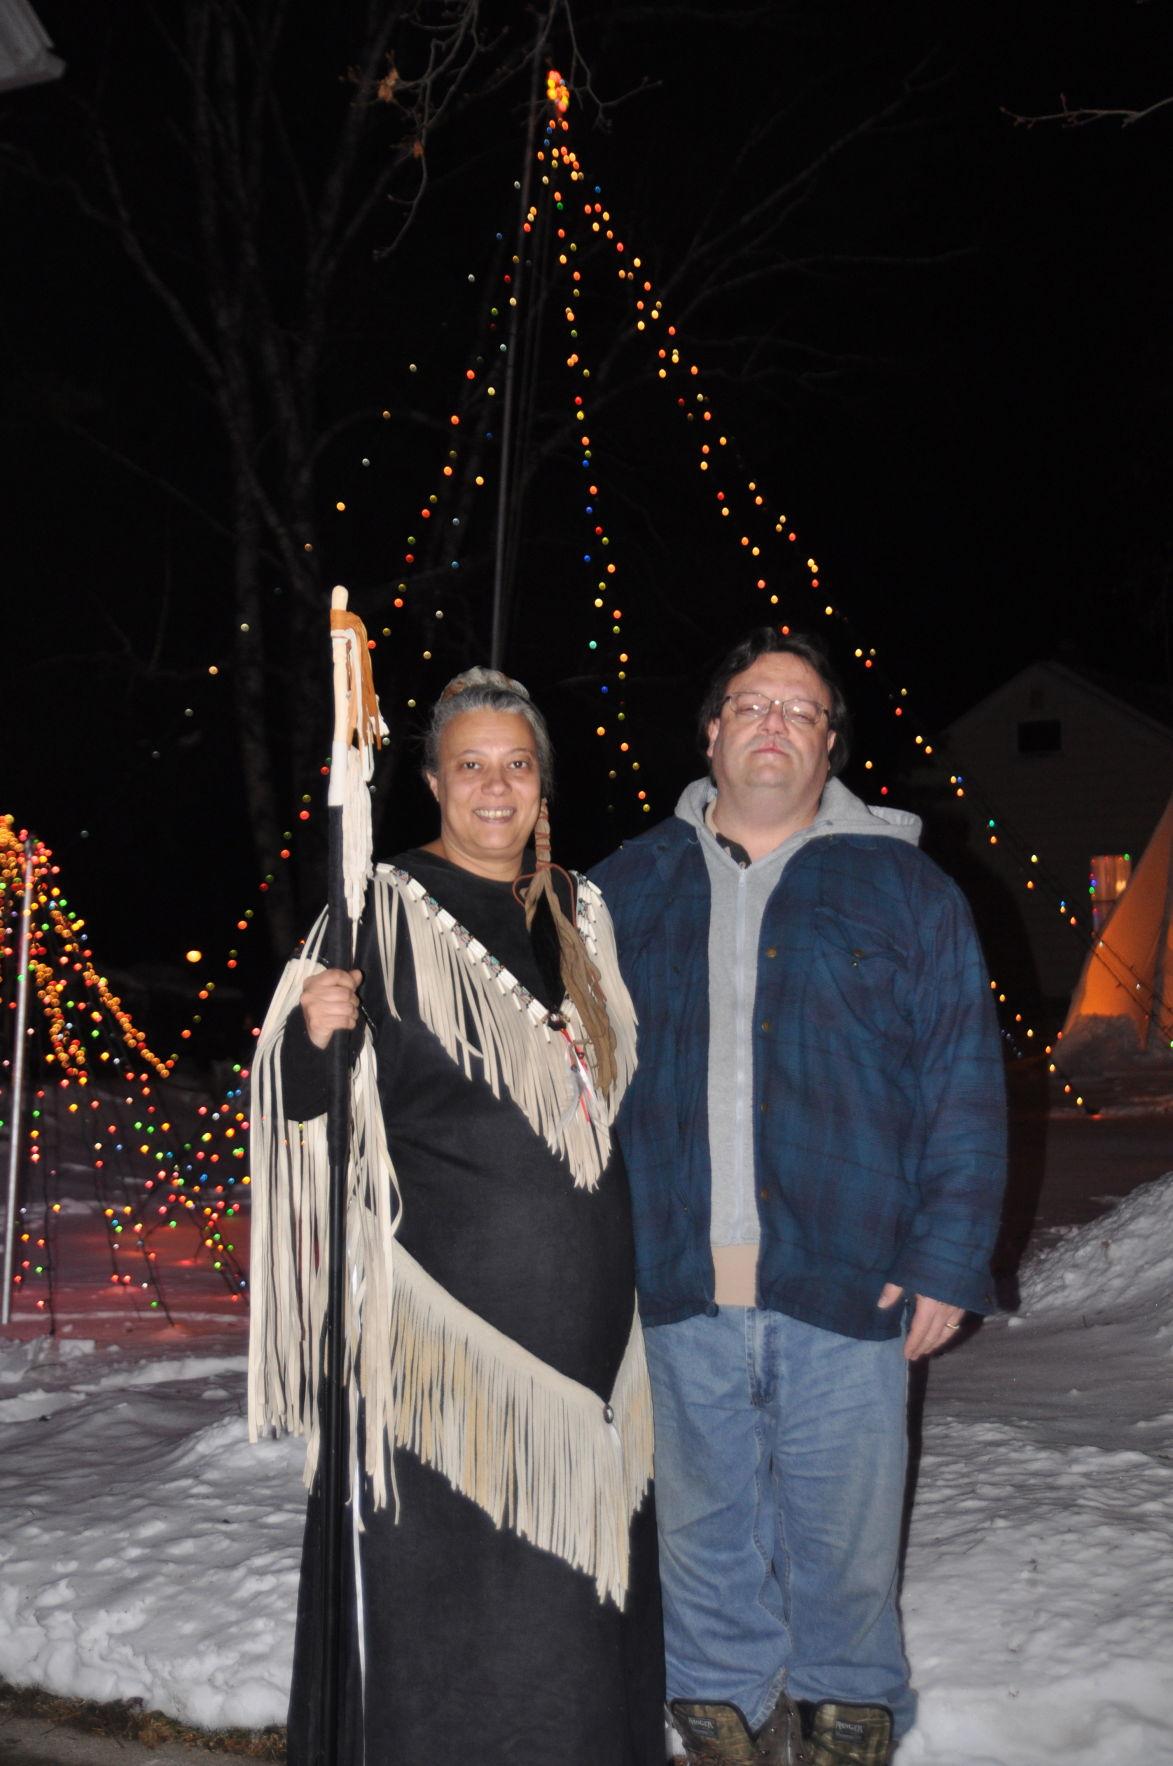 Couple's display shines light on holiday